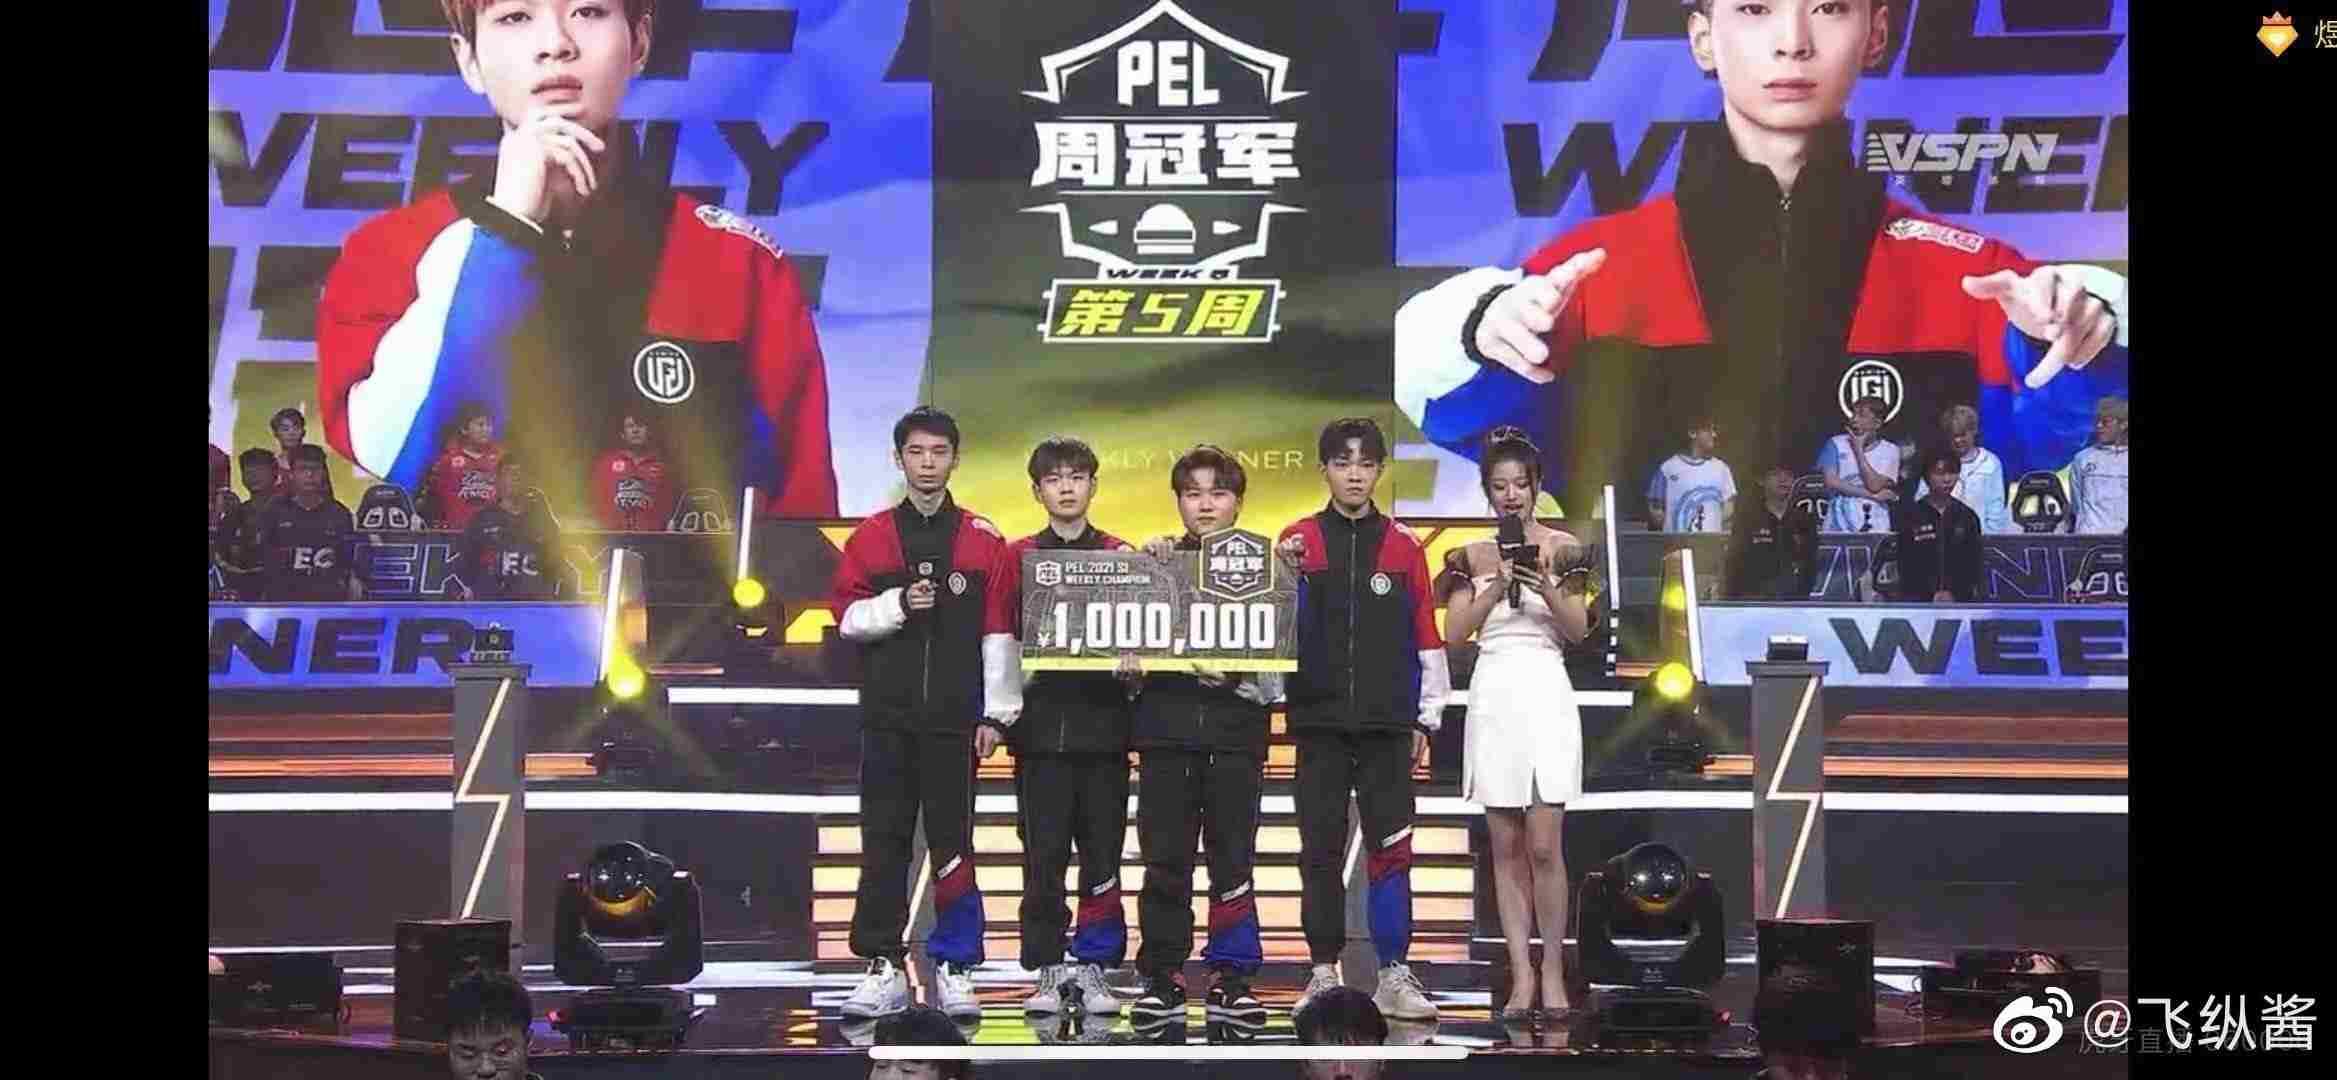 Winner of PEL 2021 Season 1